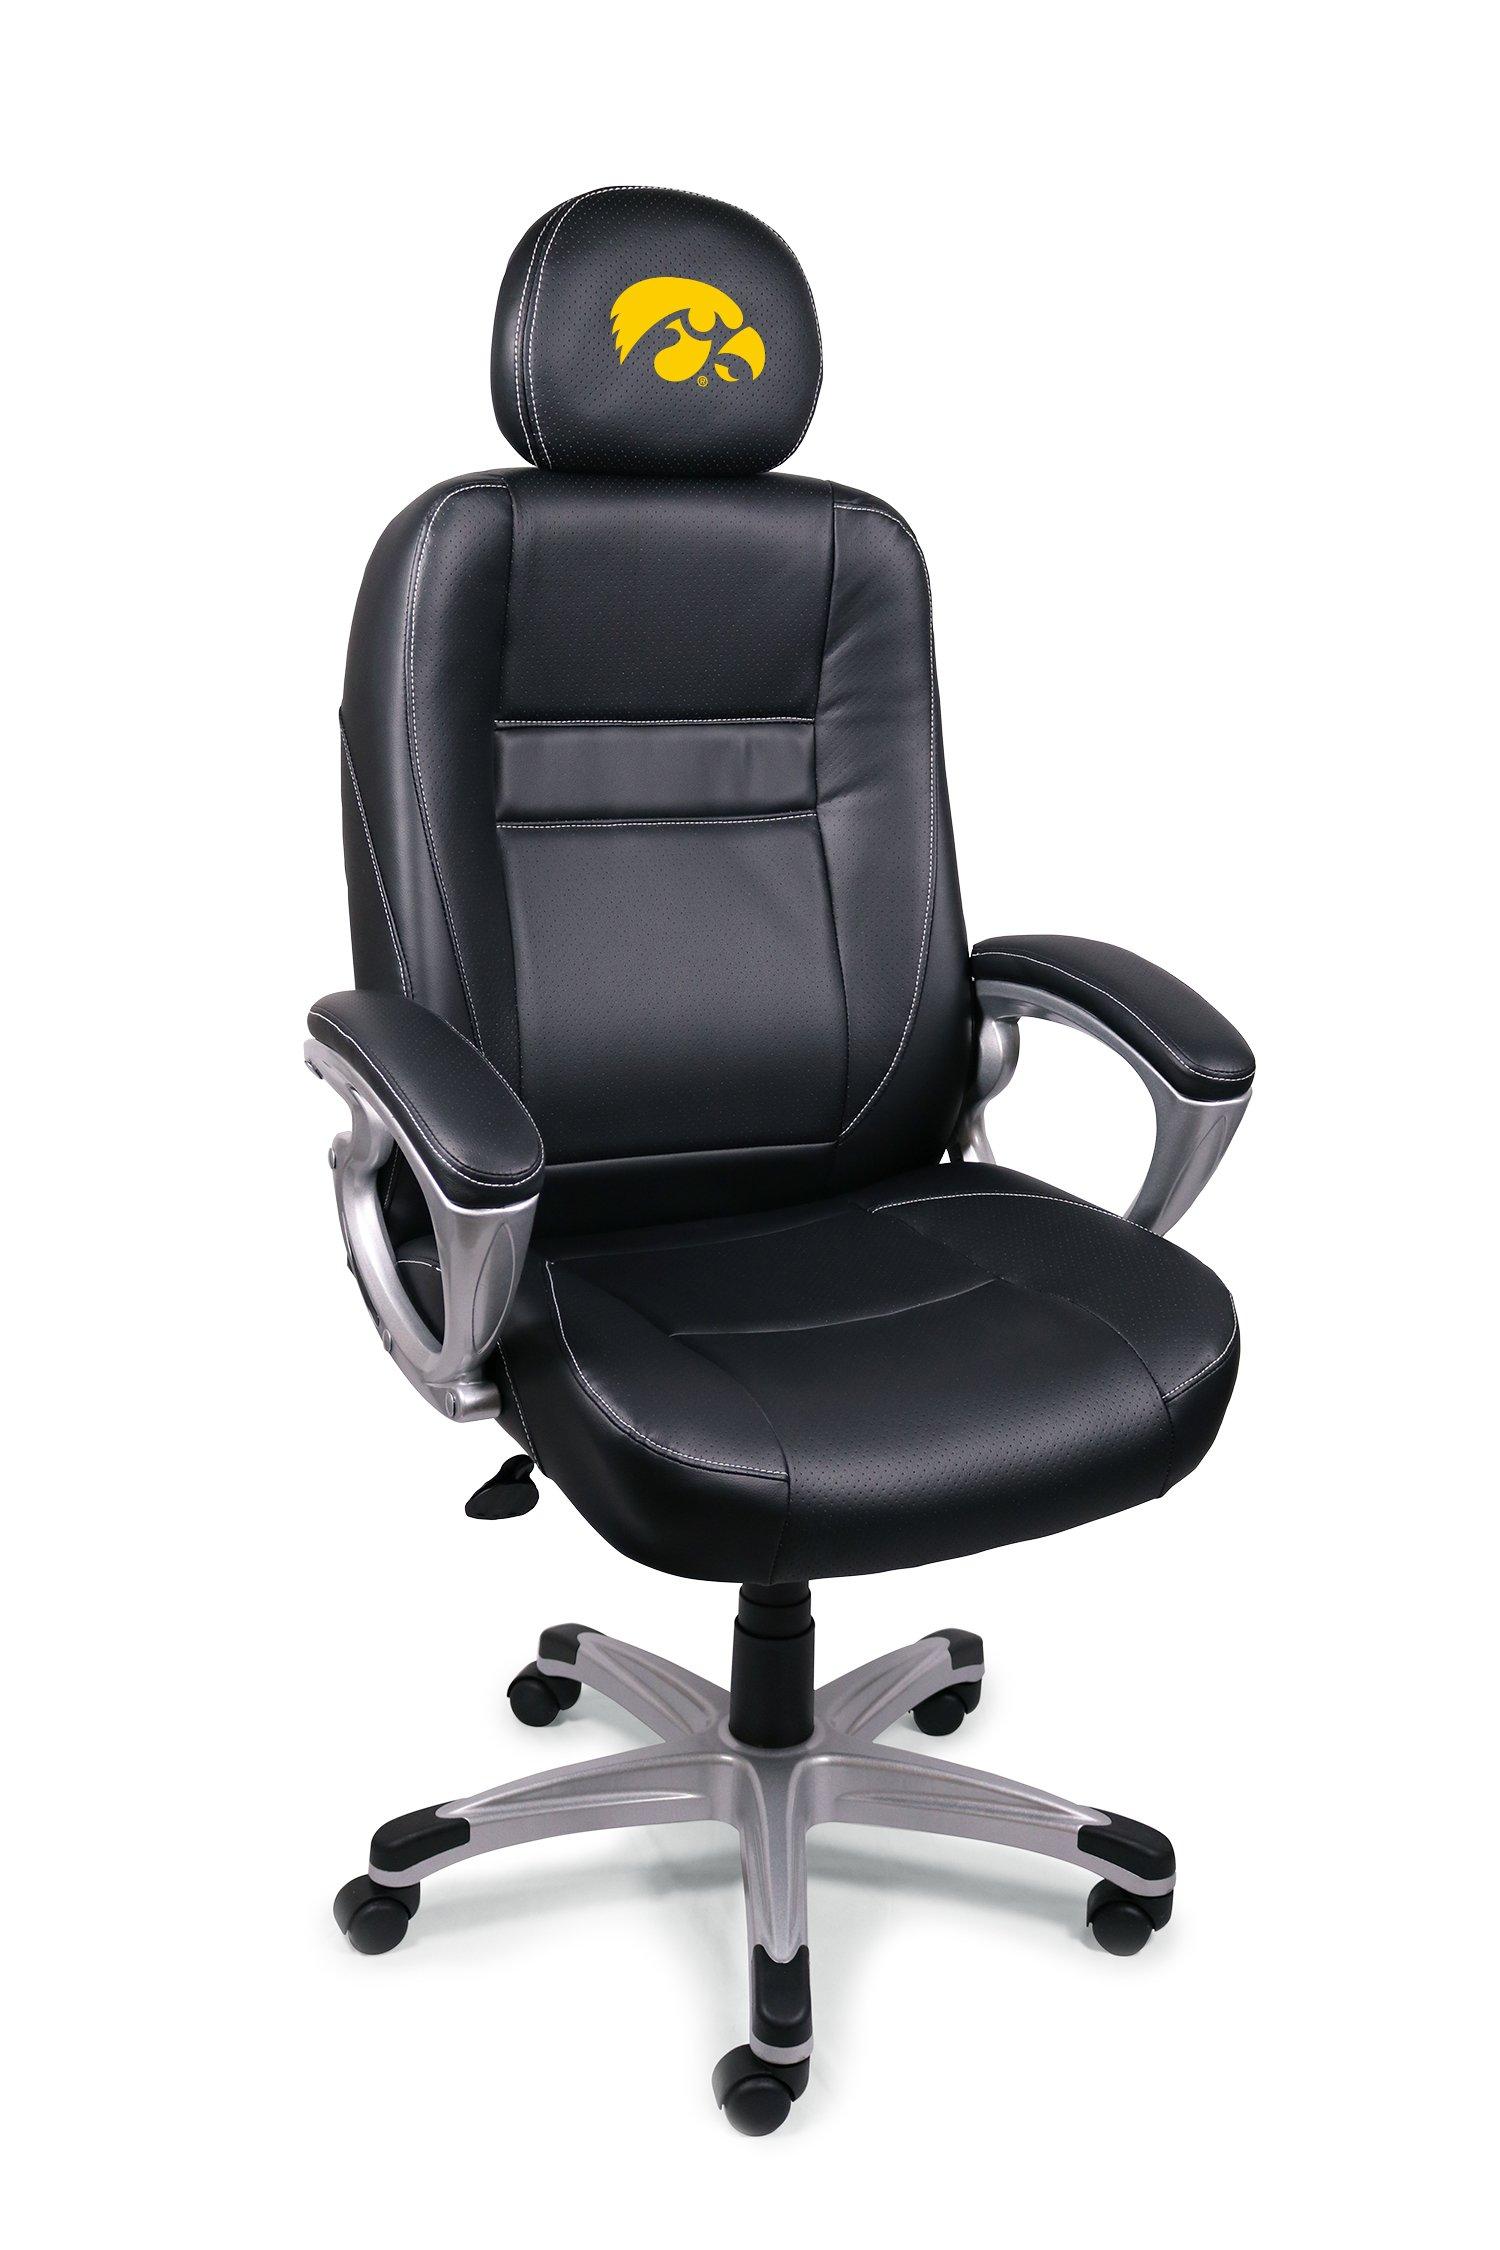 Wild Sports NCAA College Iowa Hawkeyes Leather Office Chair